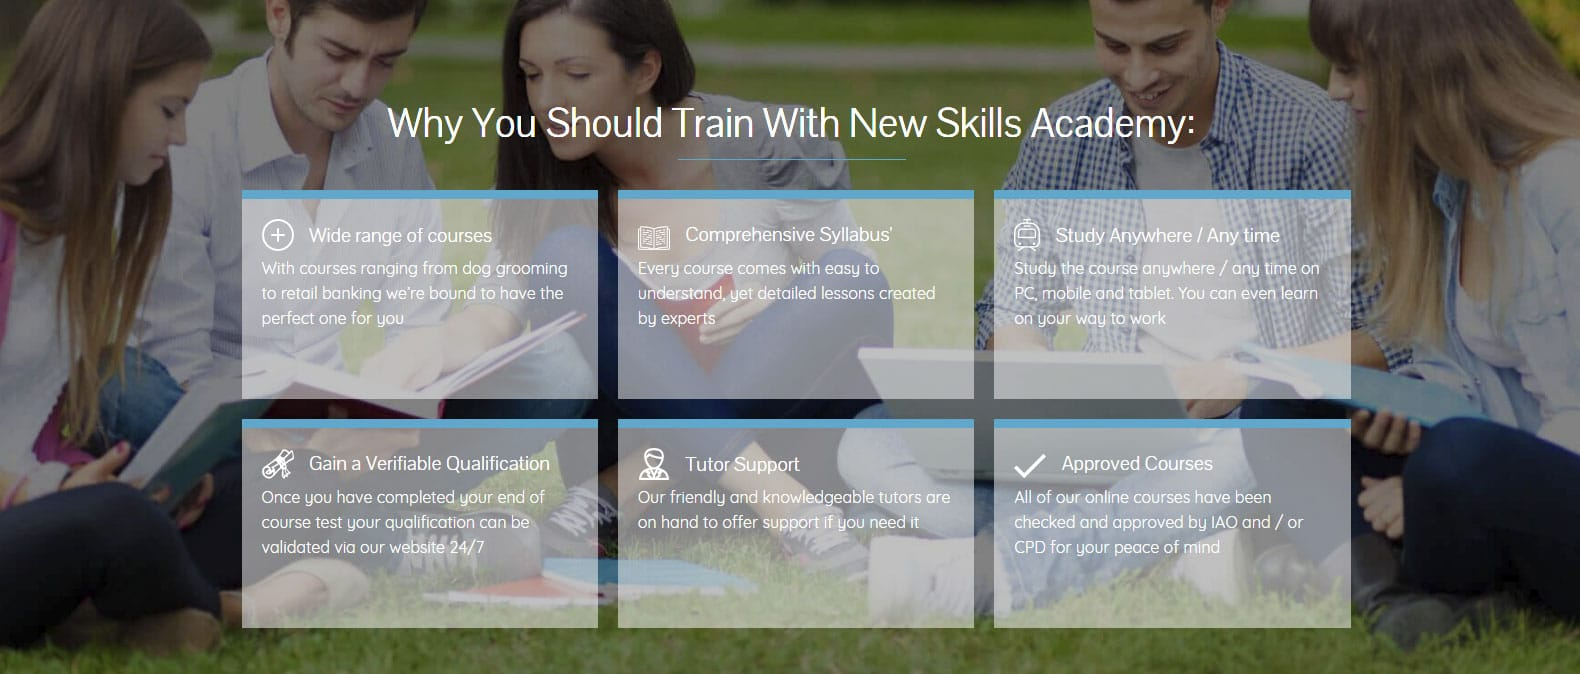 Why New Skills